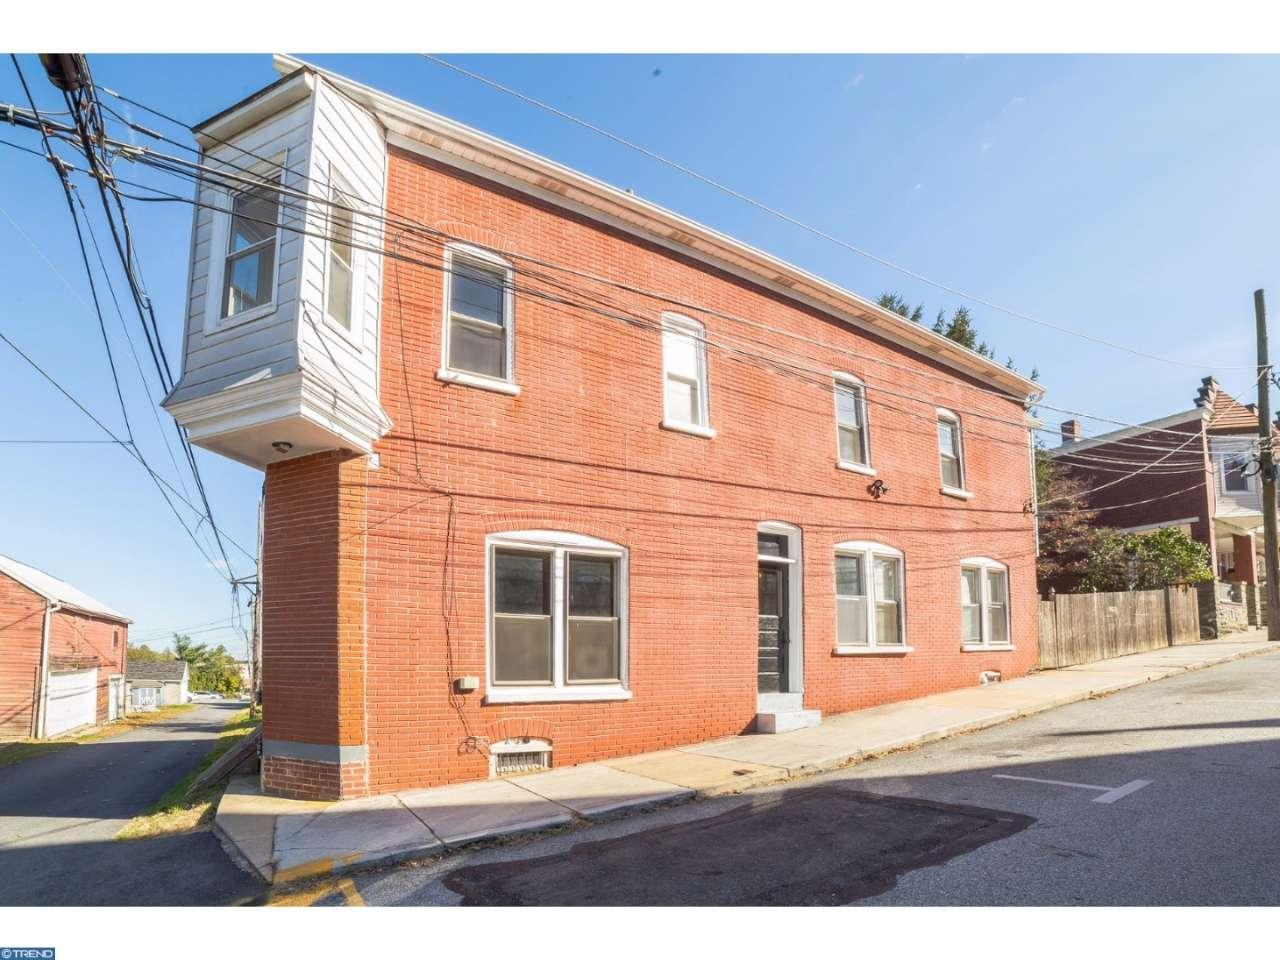 Property for sale at 101 CHESTNUT ST, Parkesburg,  PA 19365